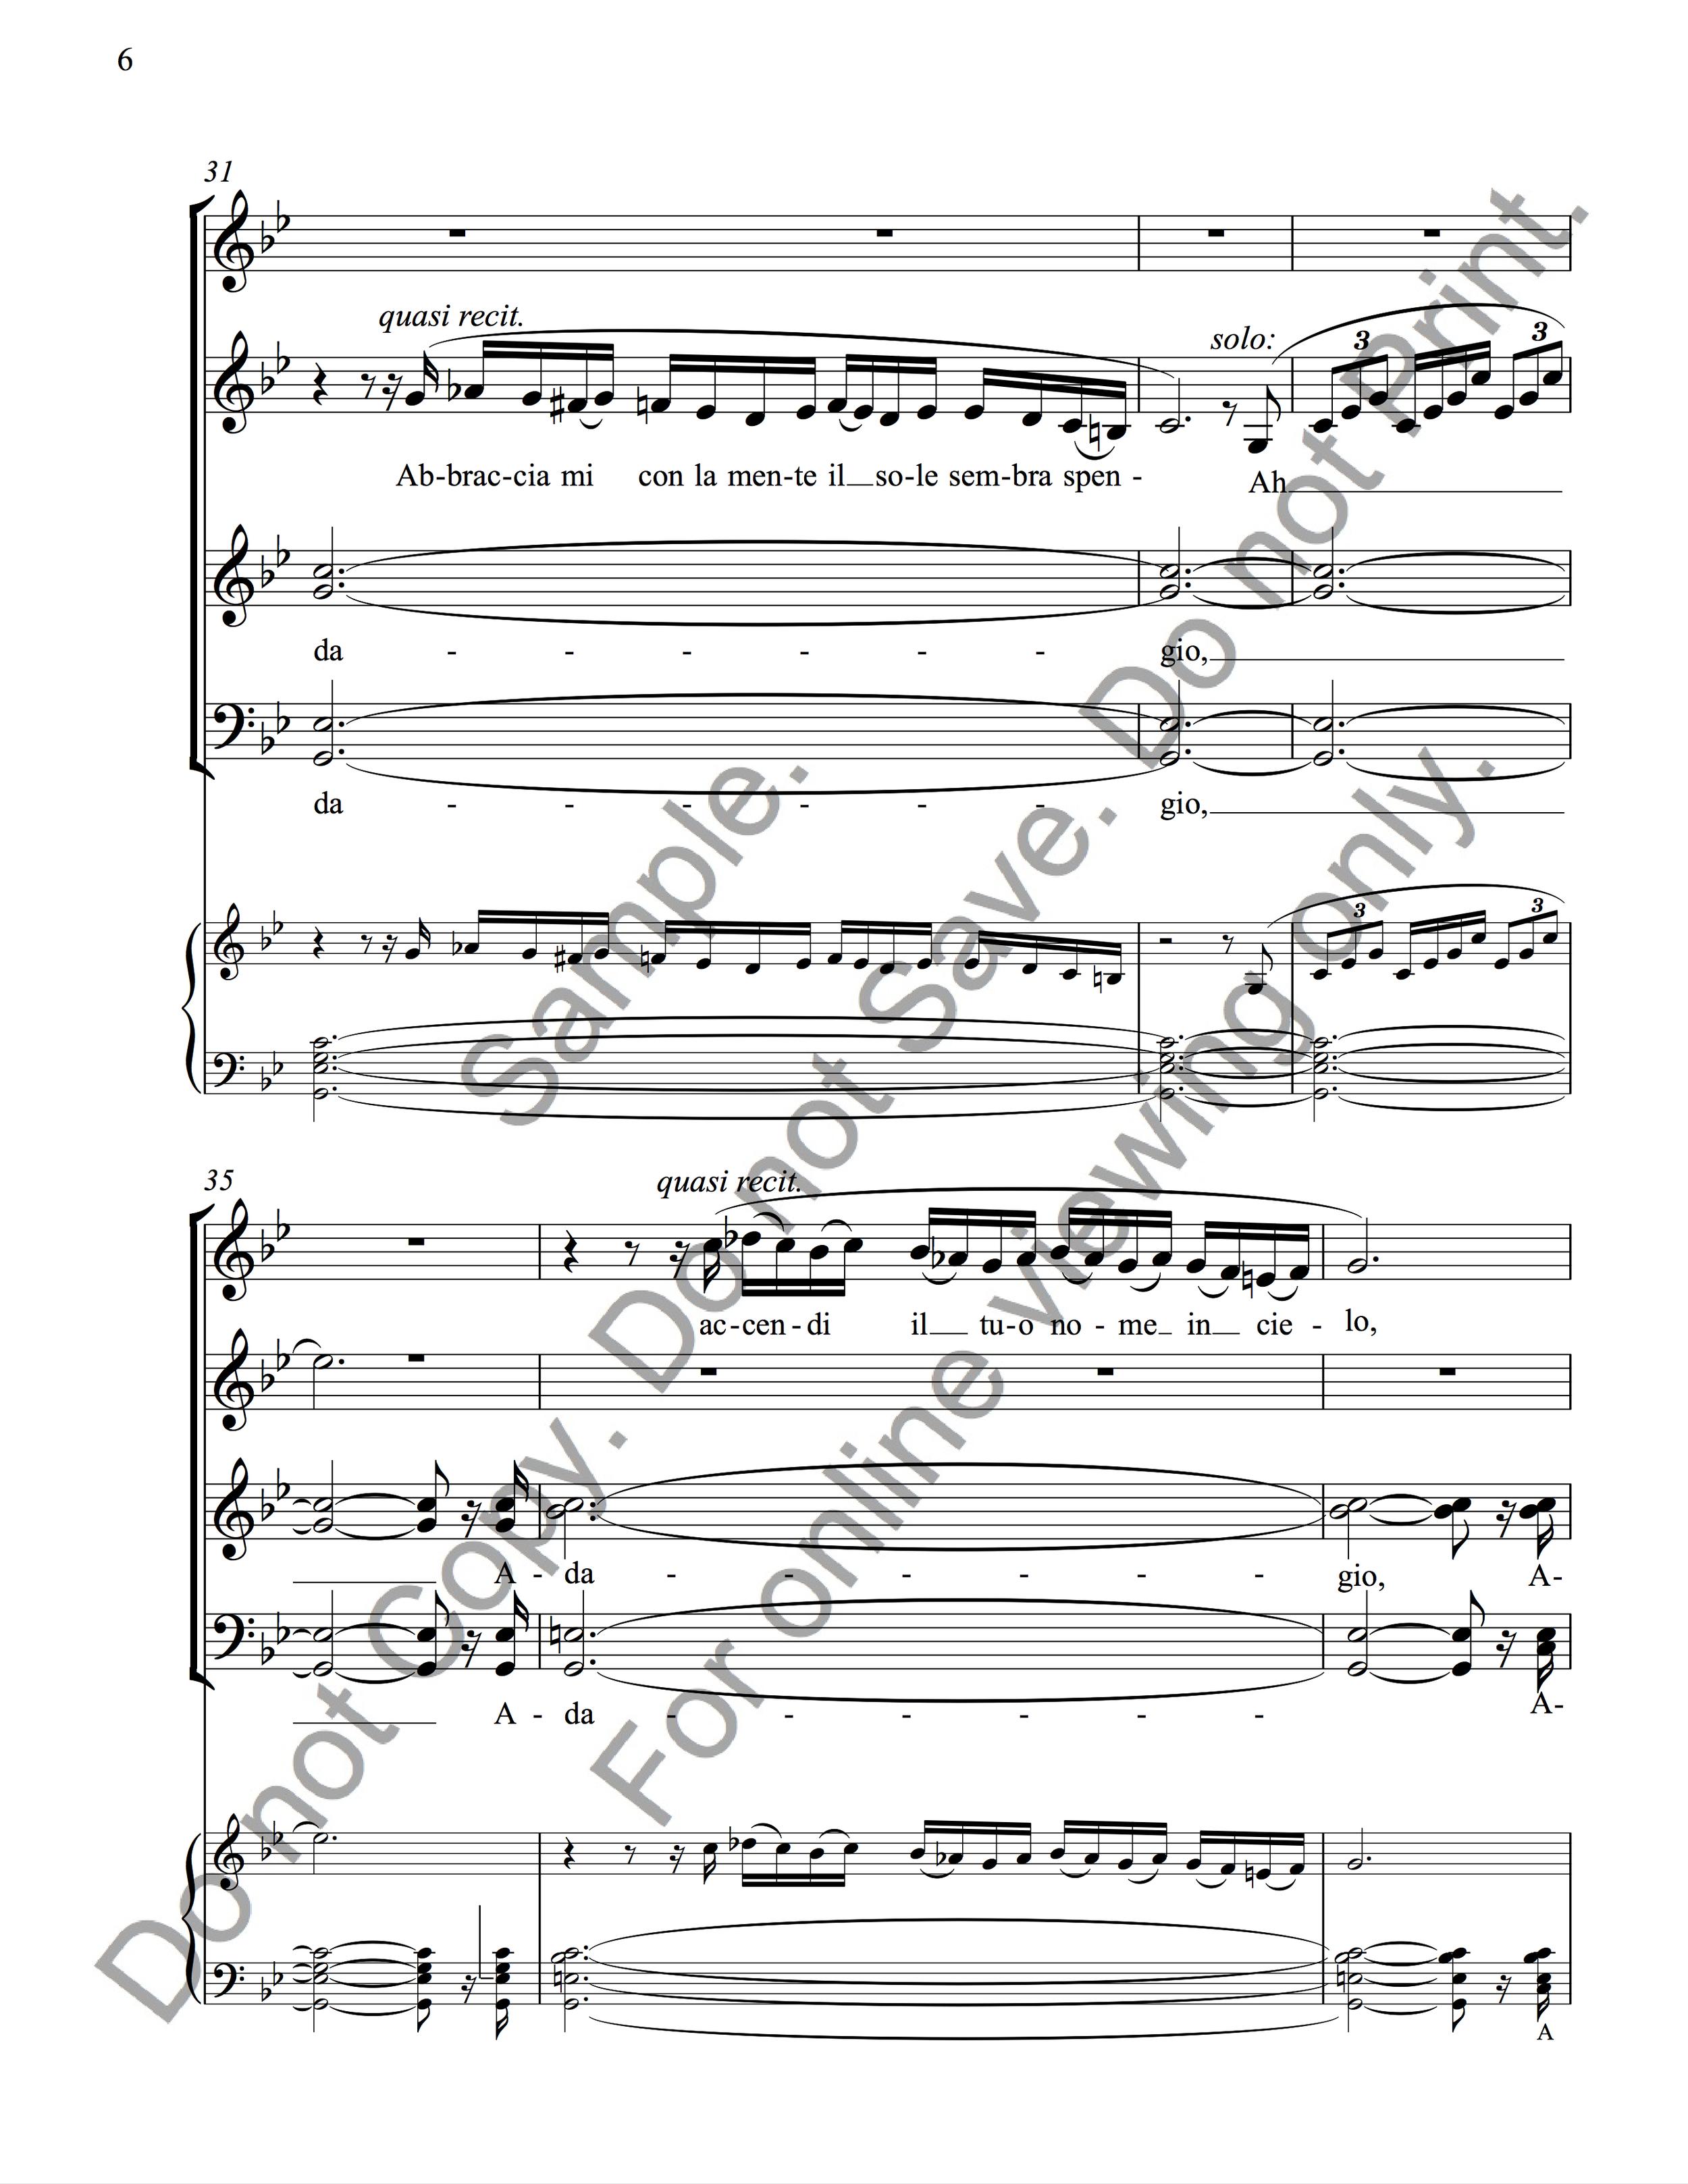 Albinoni's Adagio07_0006.png